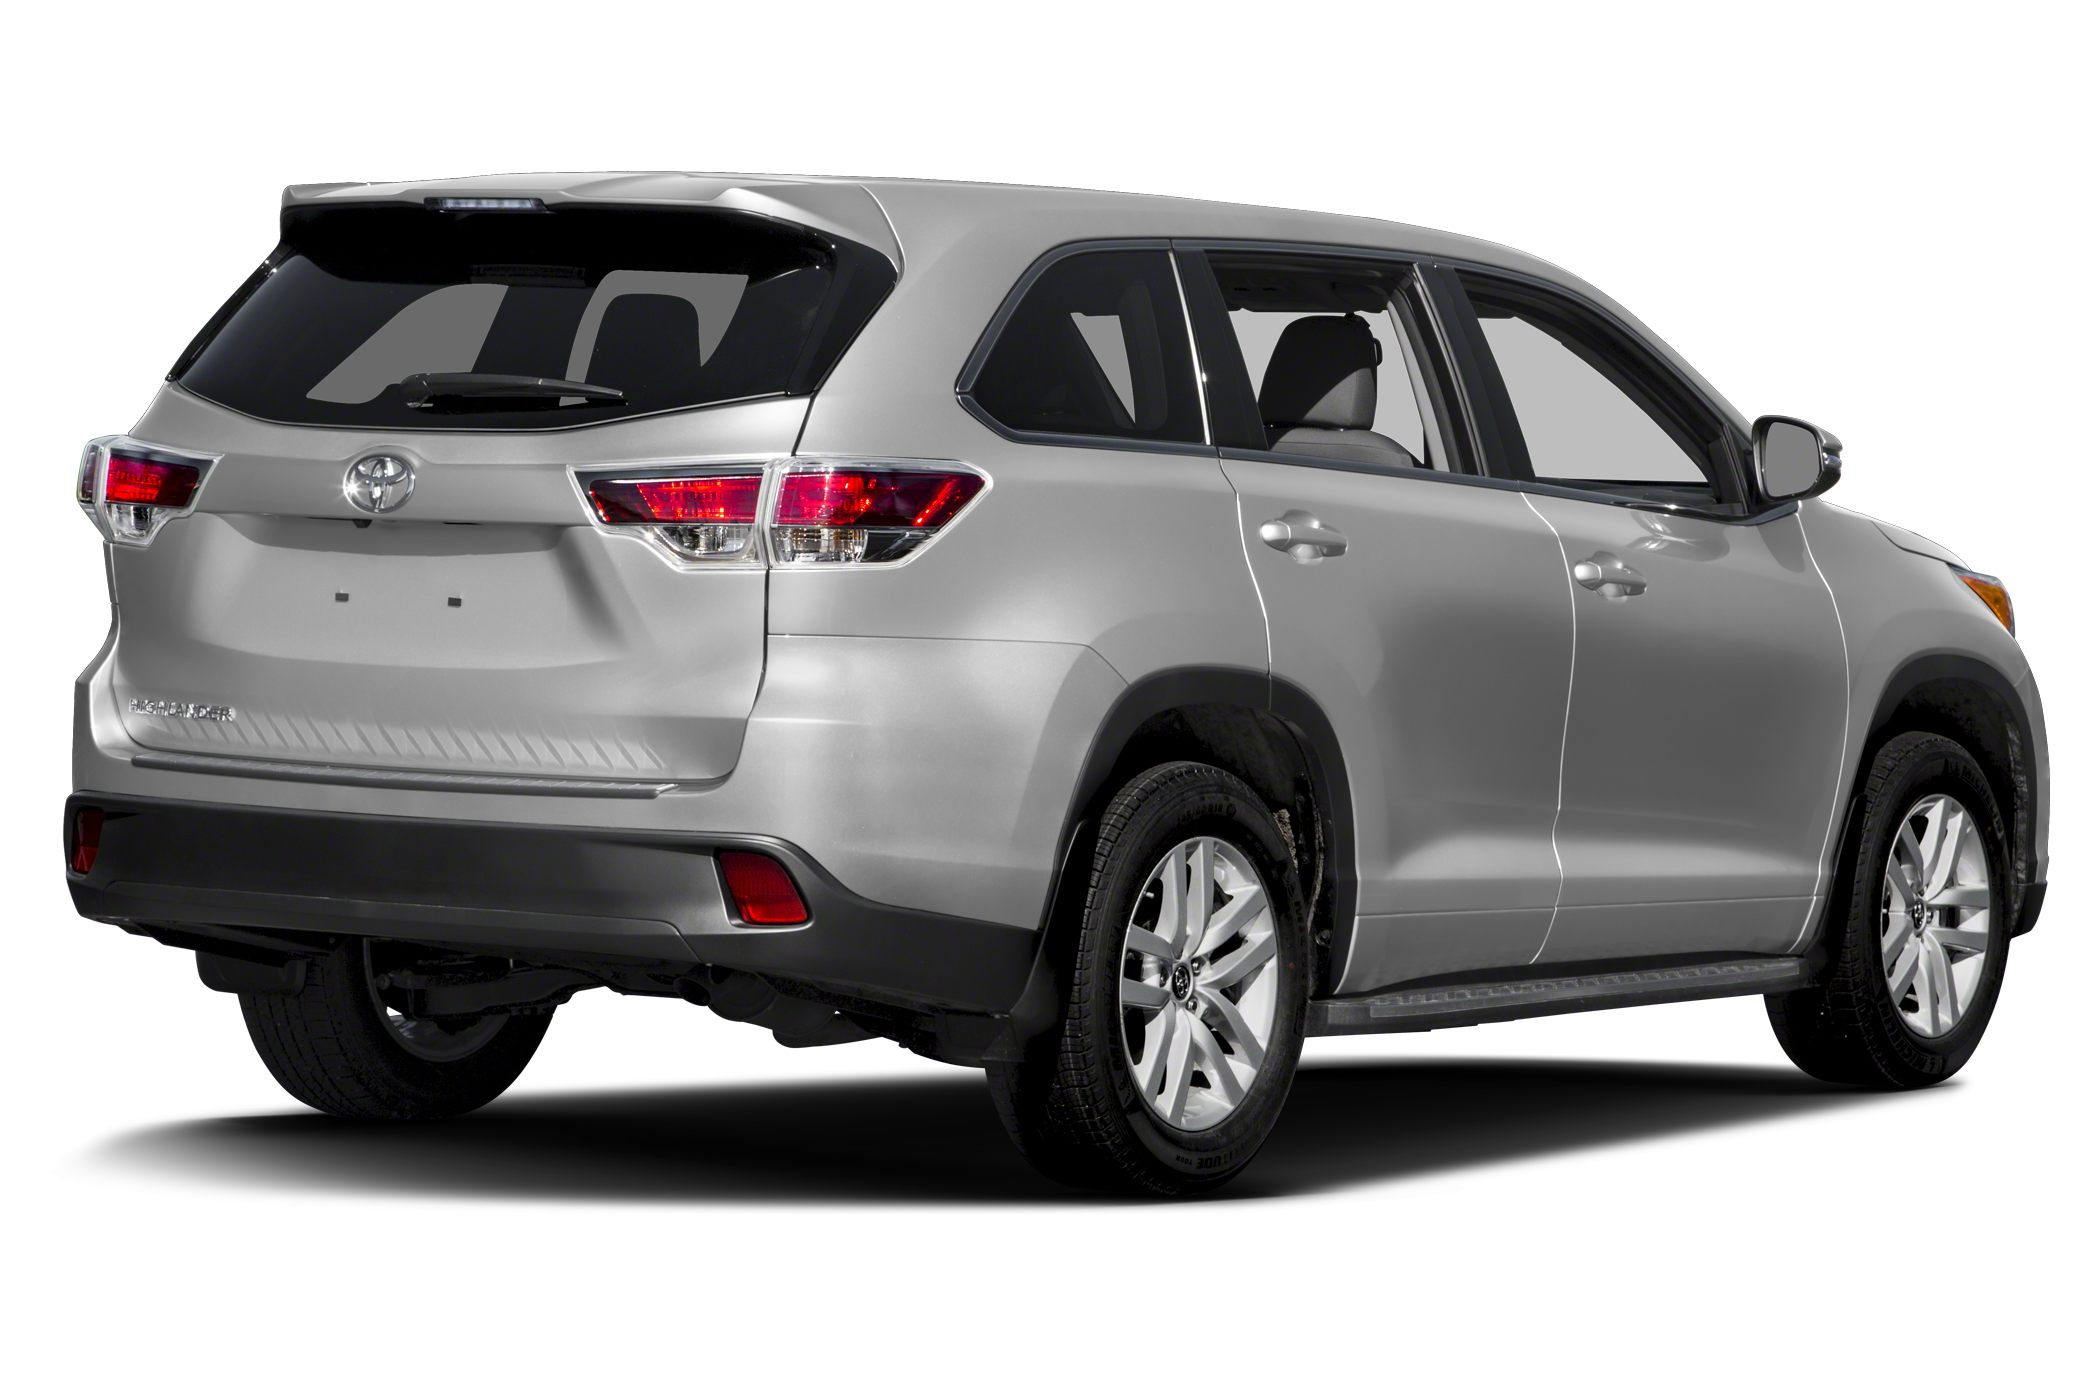 2016 Toyota Highlander LE Vehicle Options ABS Brakes Interval Wipers Tachometer Adjustable Foot Pe